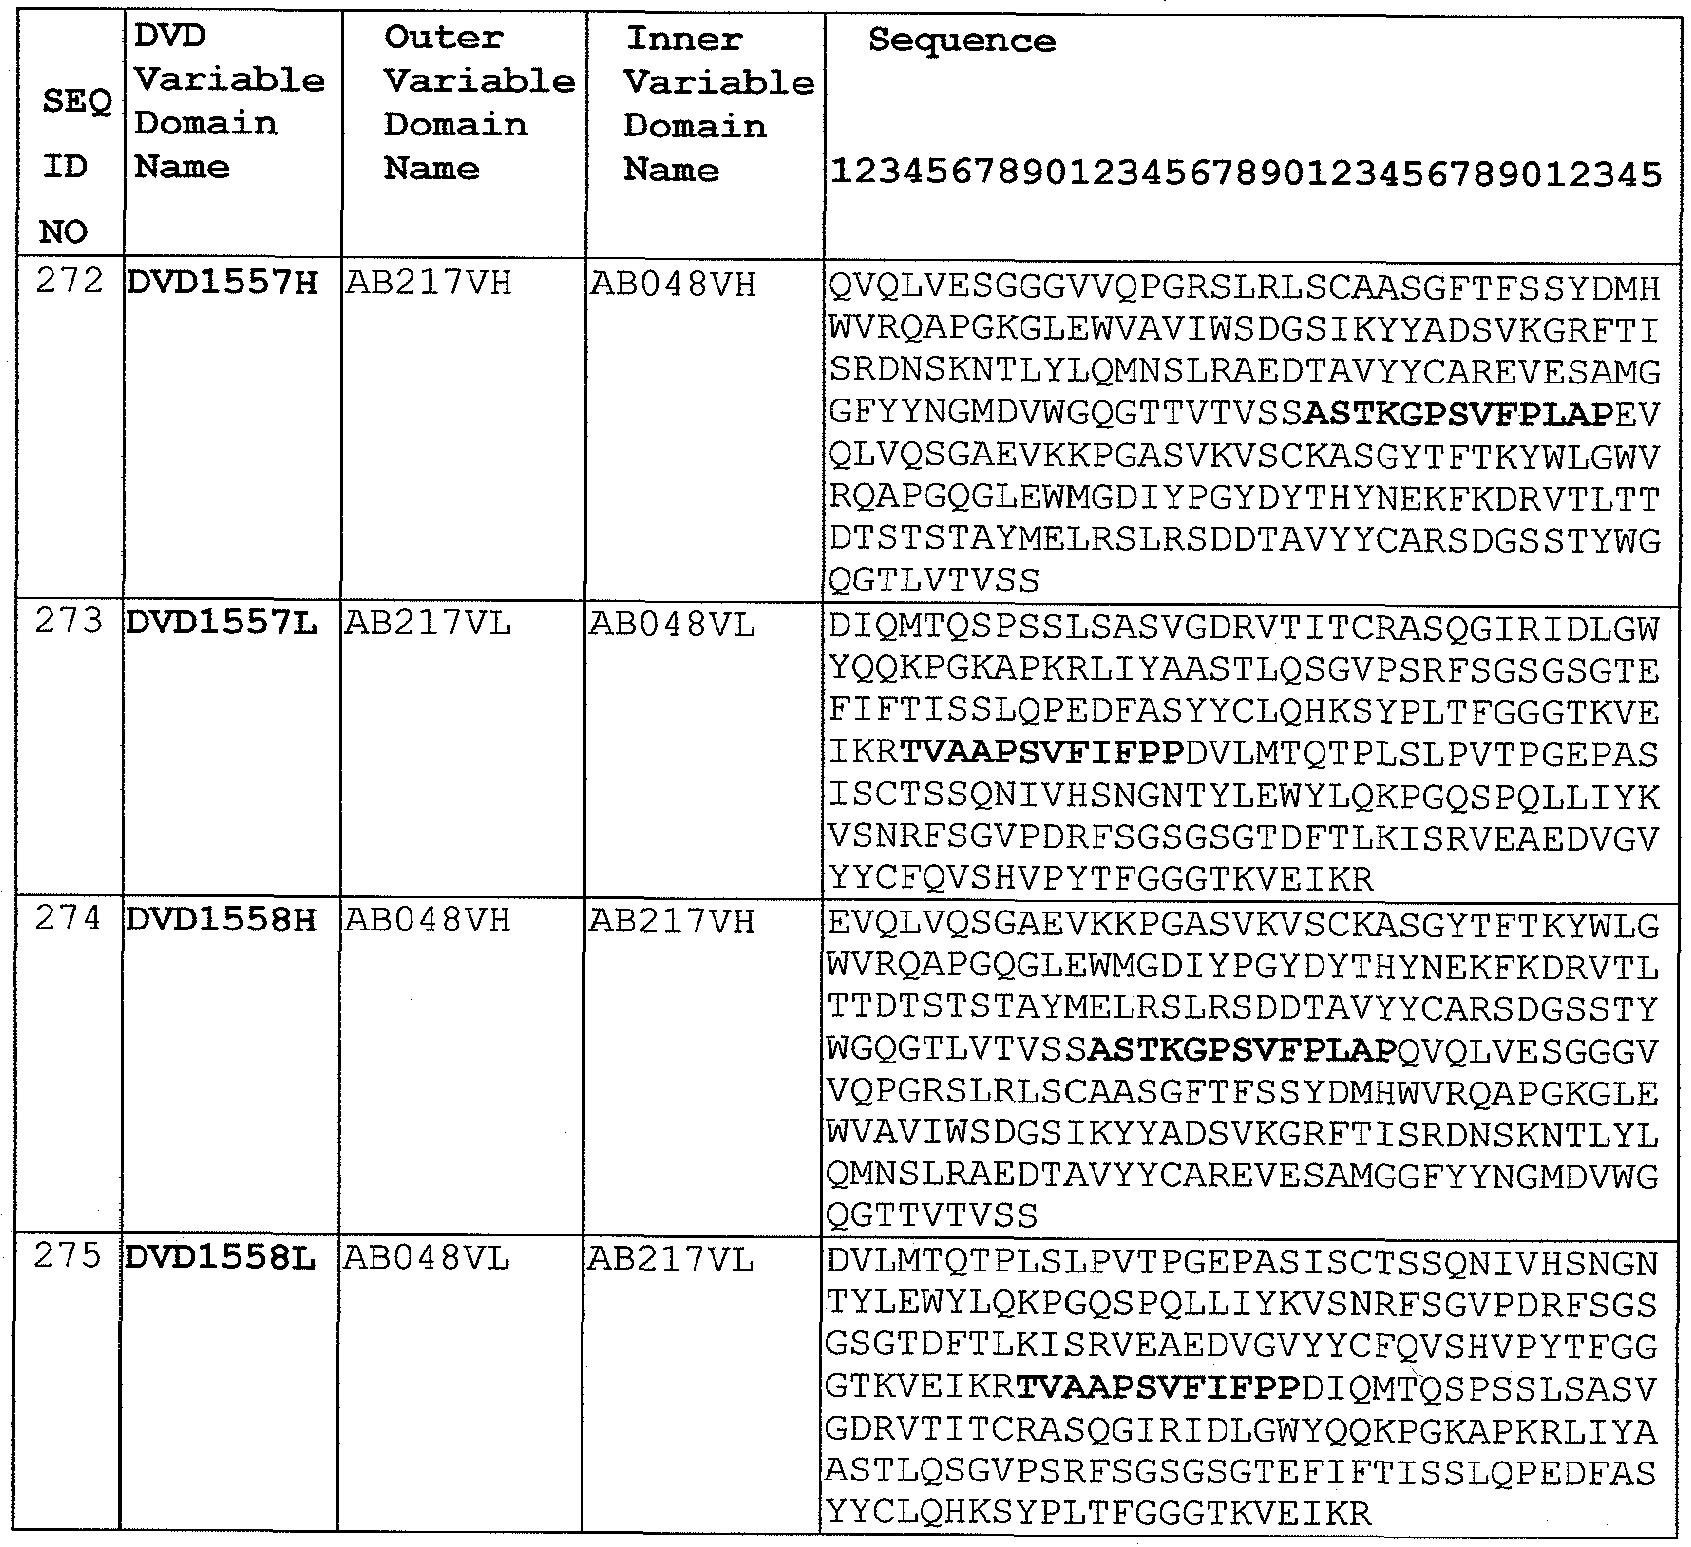 WO2012027570A2 - Dual variable domain immunoglobulins and uses